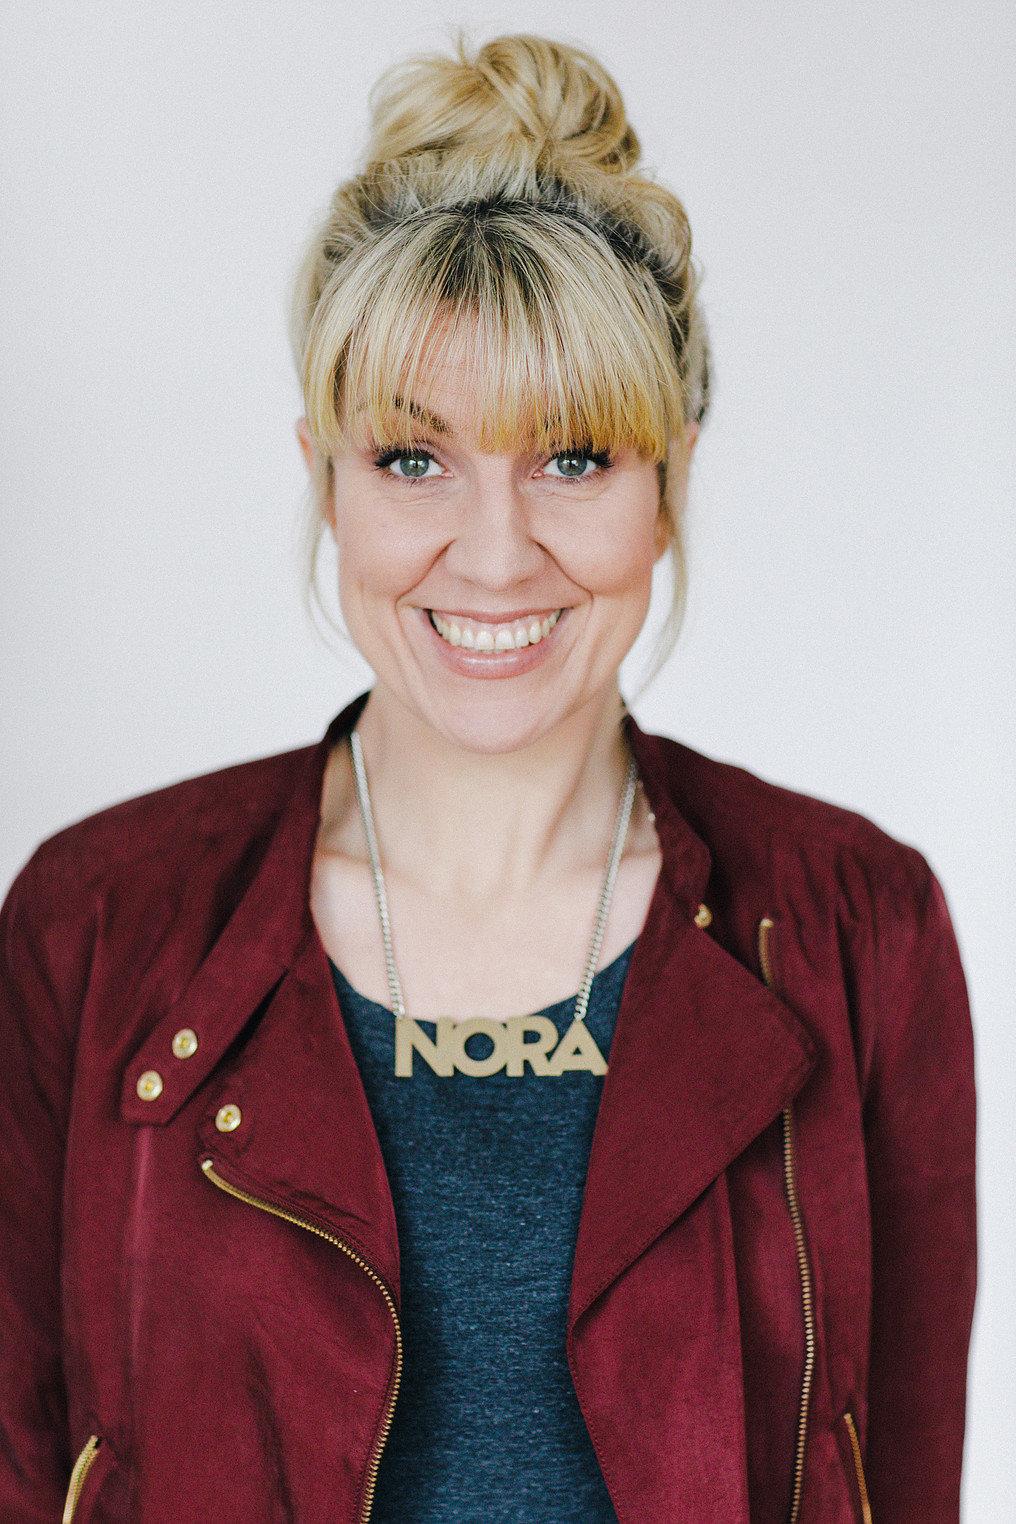 Nora Boeckler